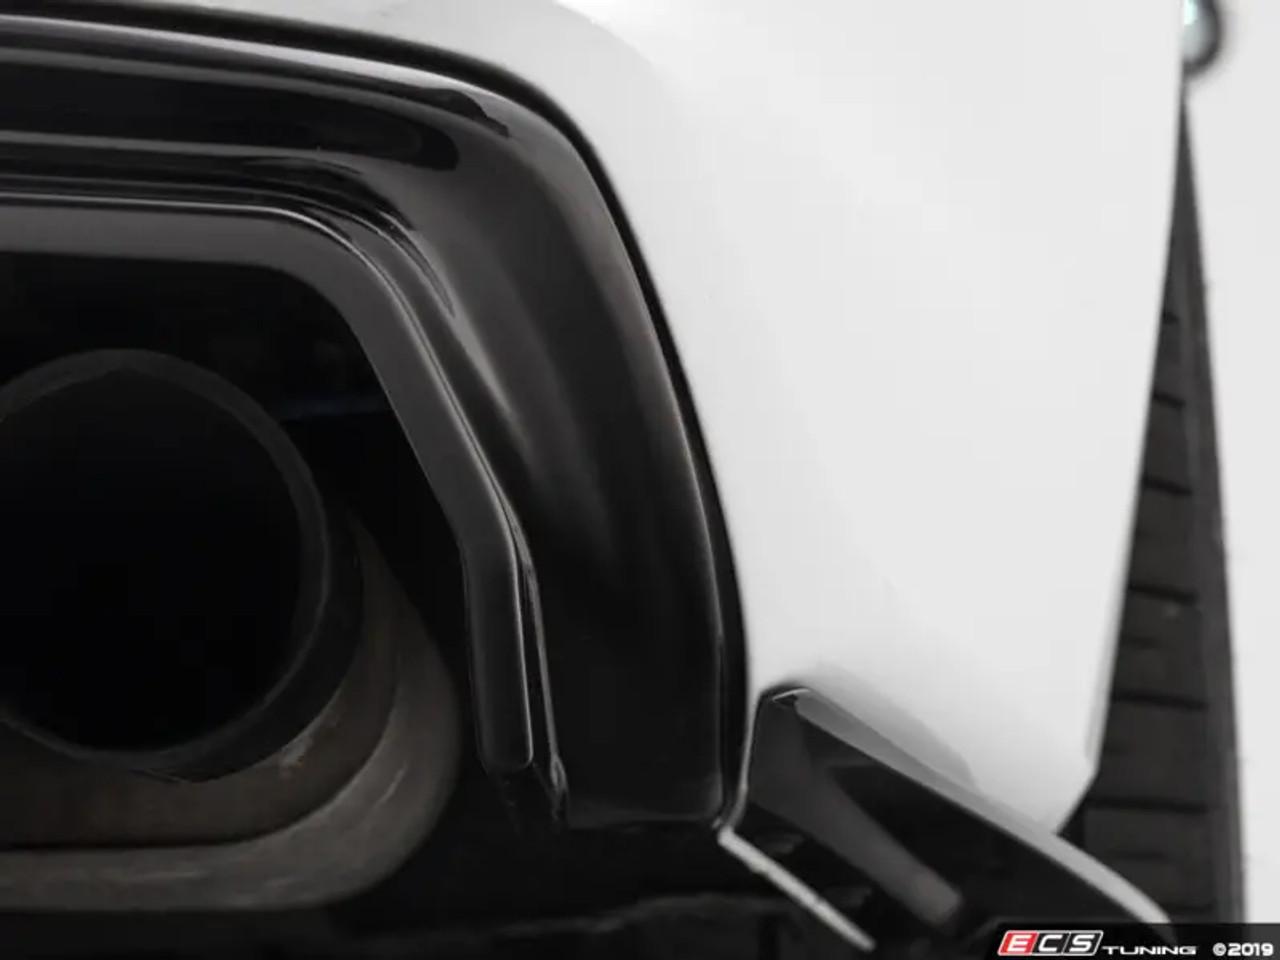 ECS Tuning Audi B8.5 S4 / A4 S-Line Rear Diffuser - Gloss Black